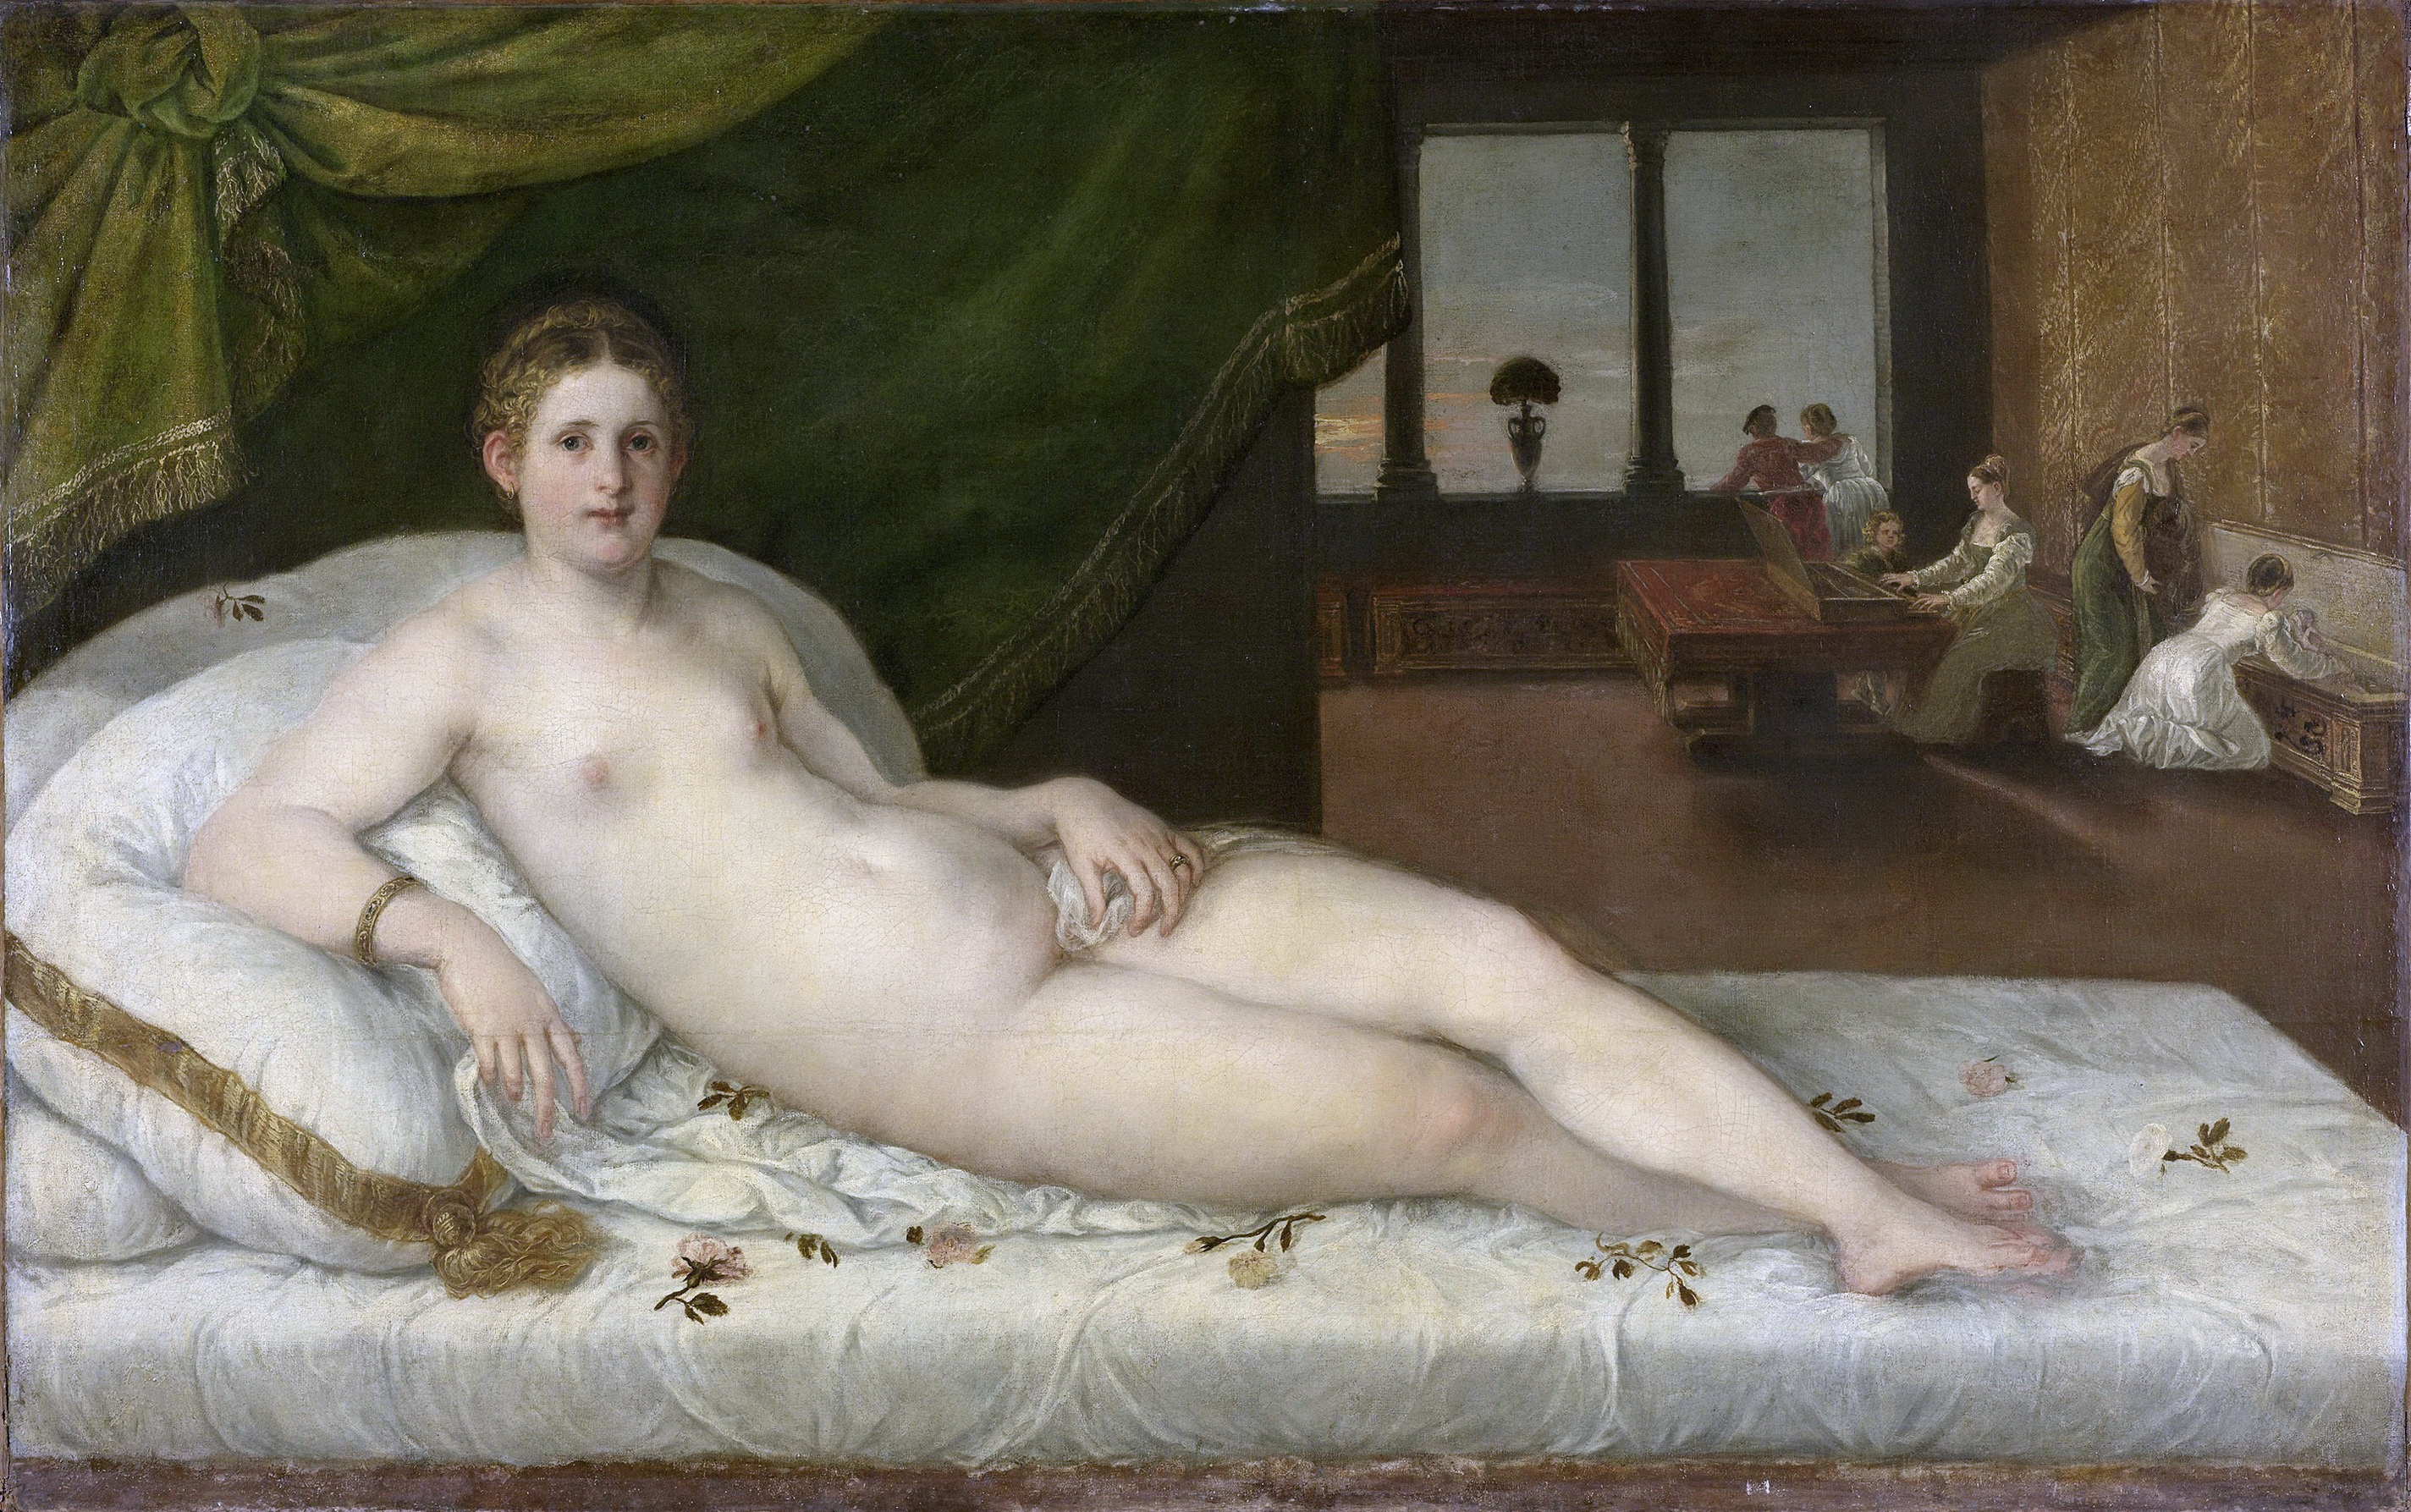 Lambert Sustris, ок.1520 - ок.1568. Венера на ложе. 1540-1565. 116 х 186 см. Амстердам, Рейксмузеум